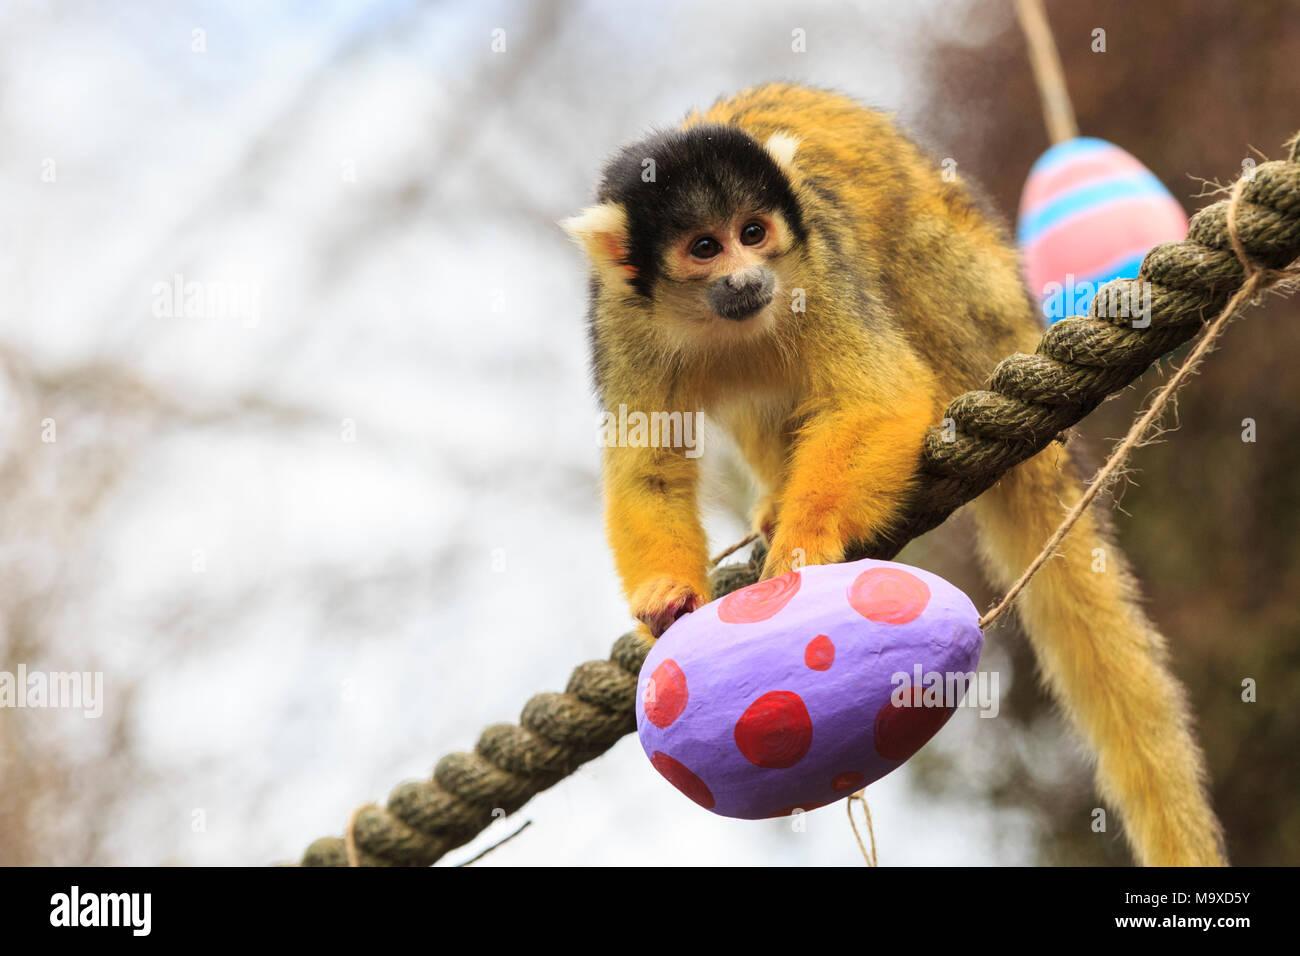 Easter Surprise Stockfotos & Easter Surprise Bilder - Seite 9 - Alamy